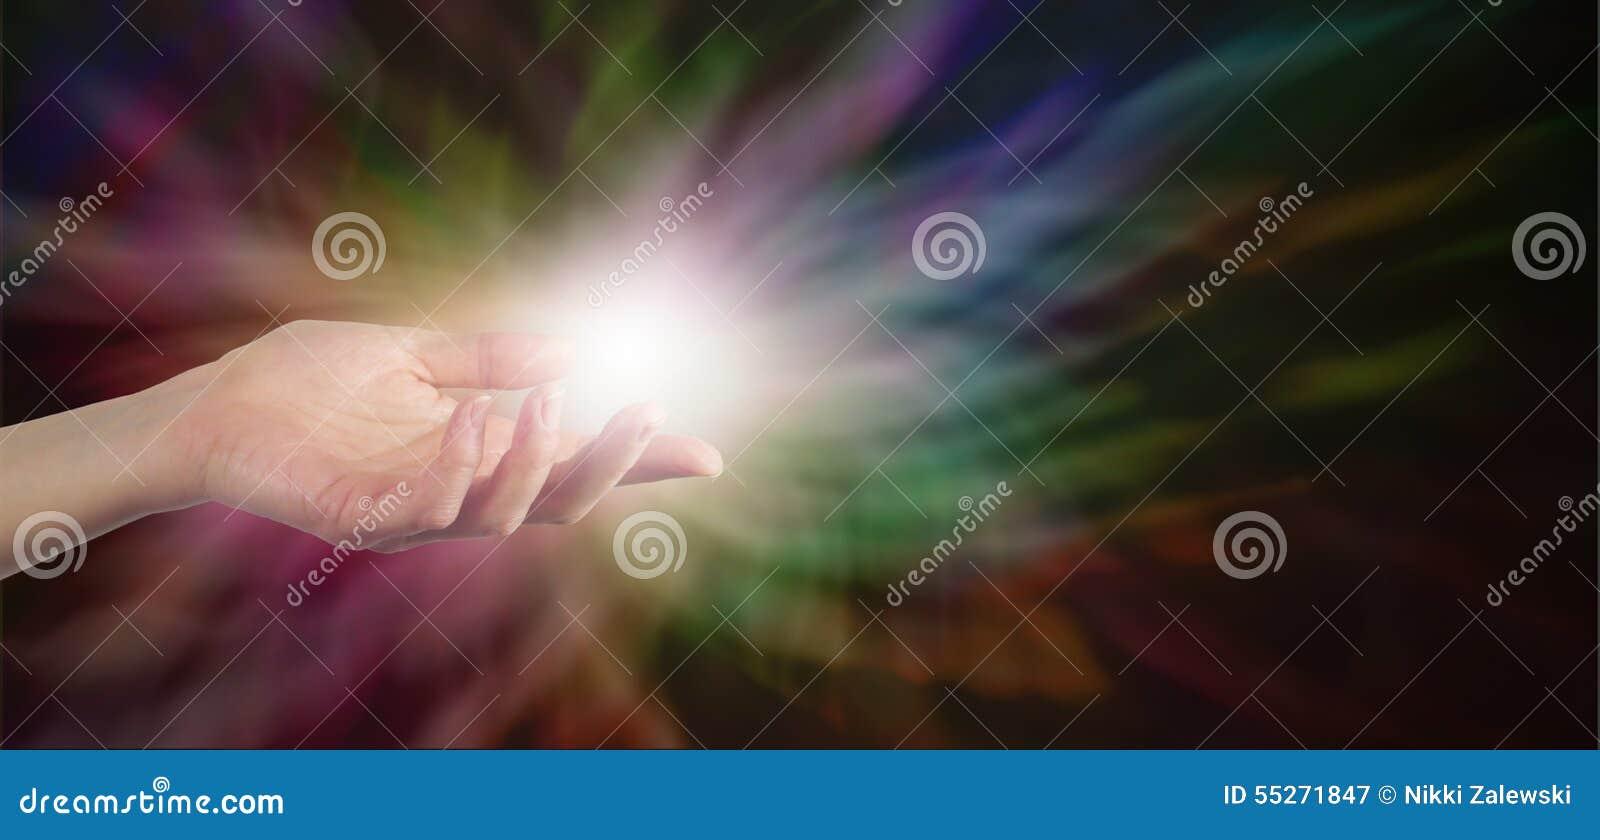 Sending Healing Energy Stock Photo Image 55271847